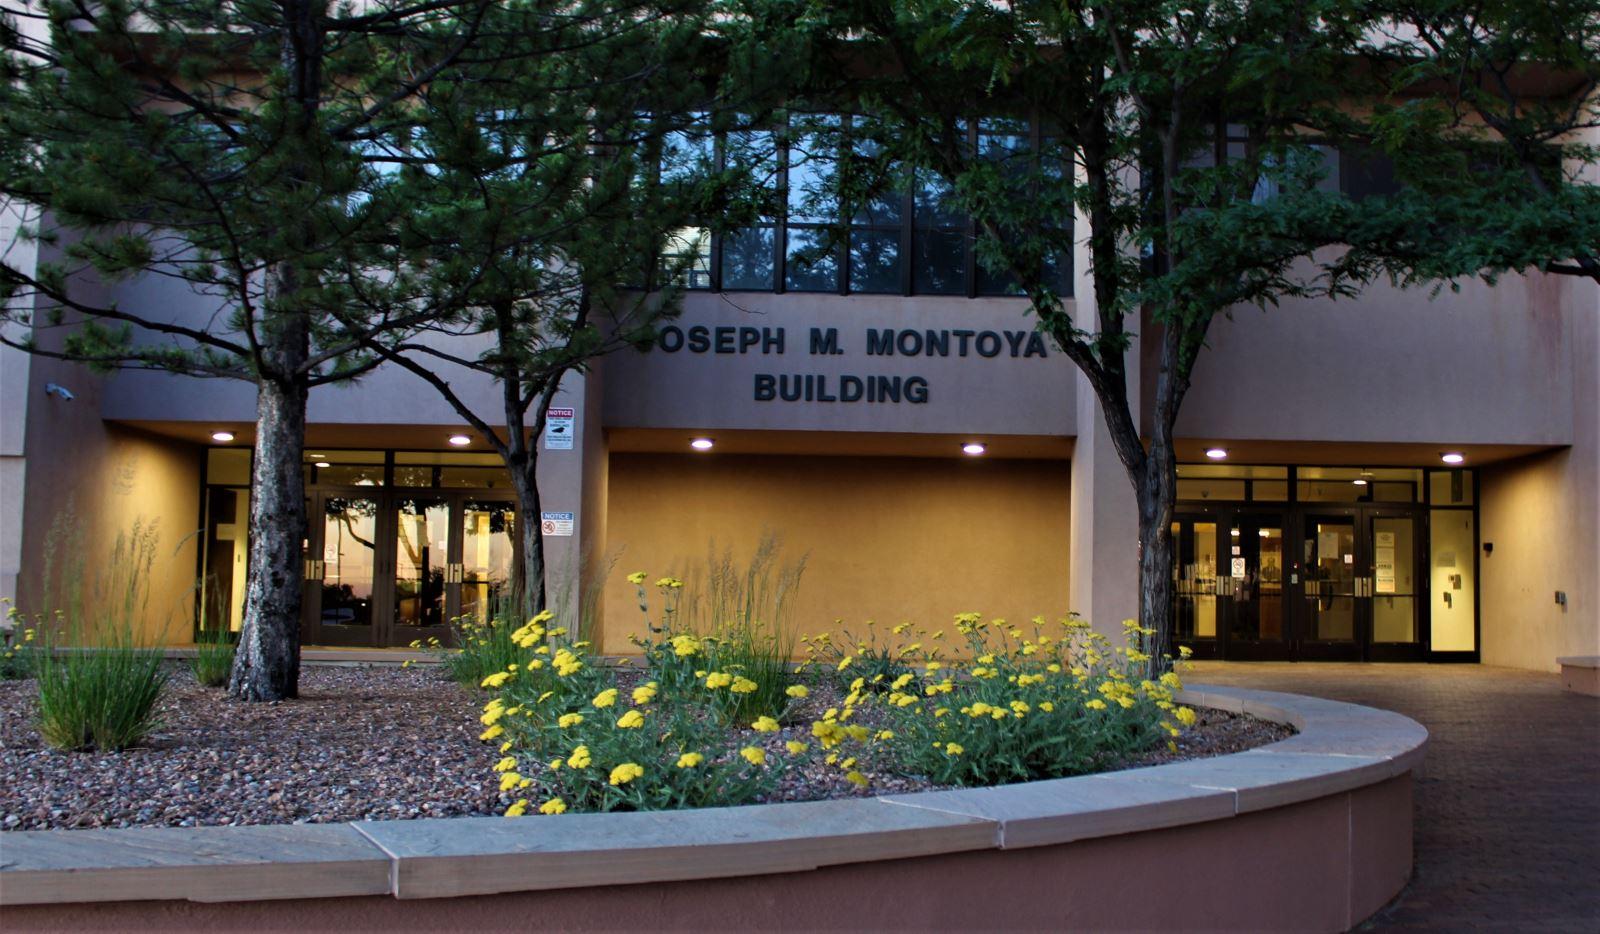 Joseph Montoya Building